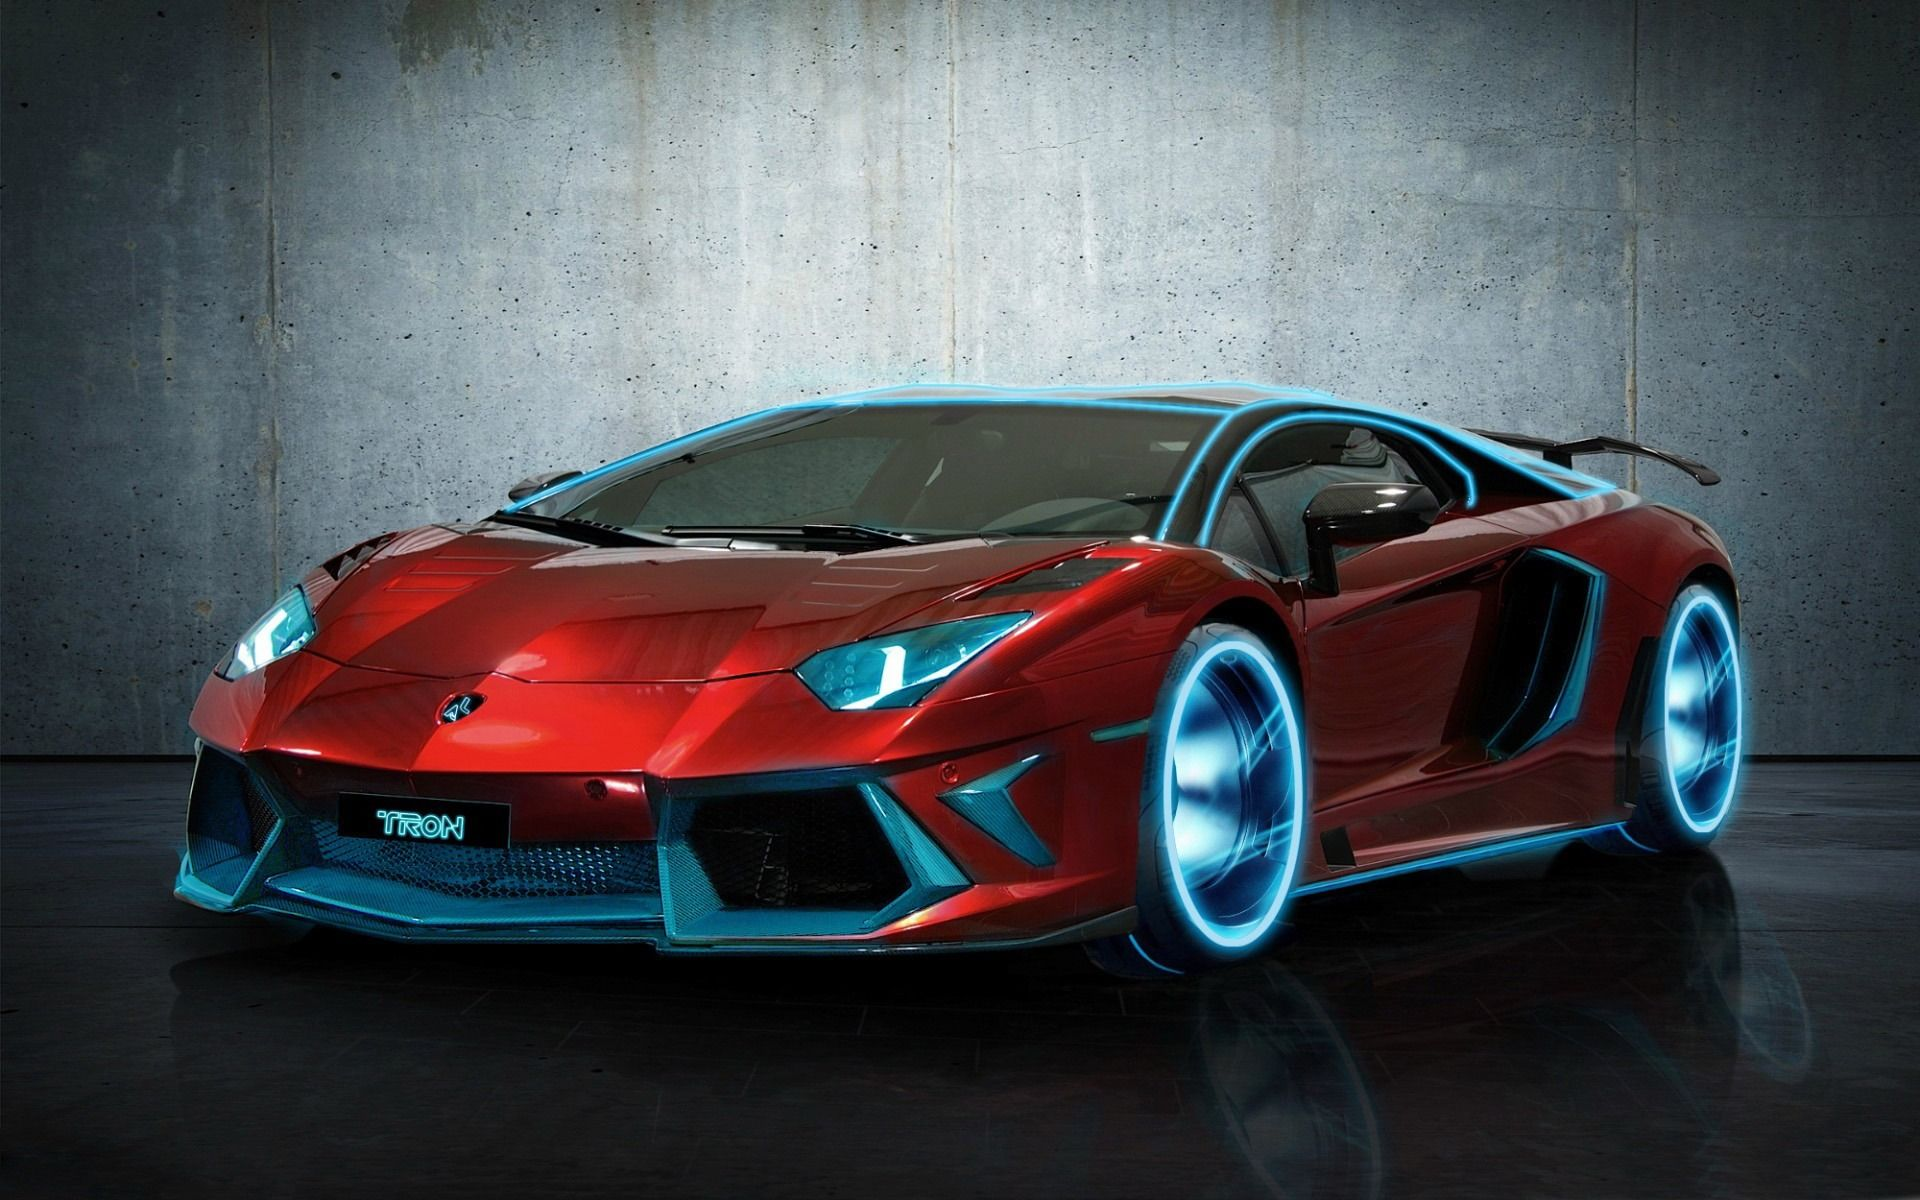 11 Awesome And Cool Cars Wallpapers | Wallpaper | Lamborghini cars, Car backgrounds, Lamborghini